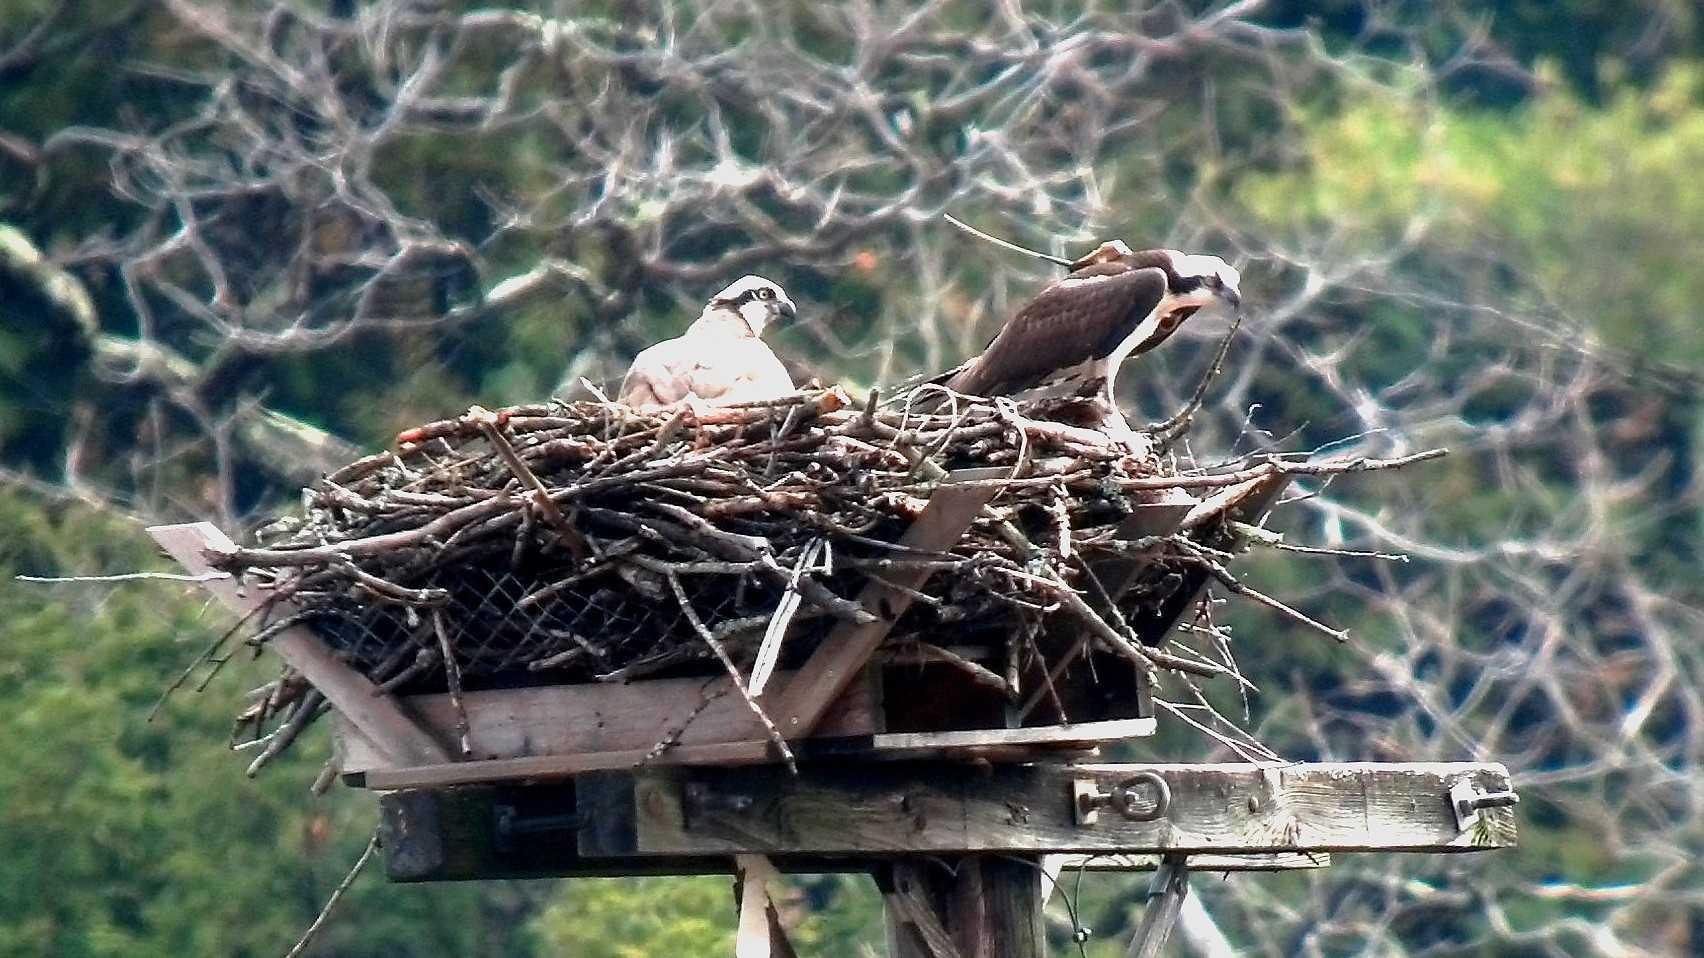 Art the osprey returns